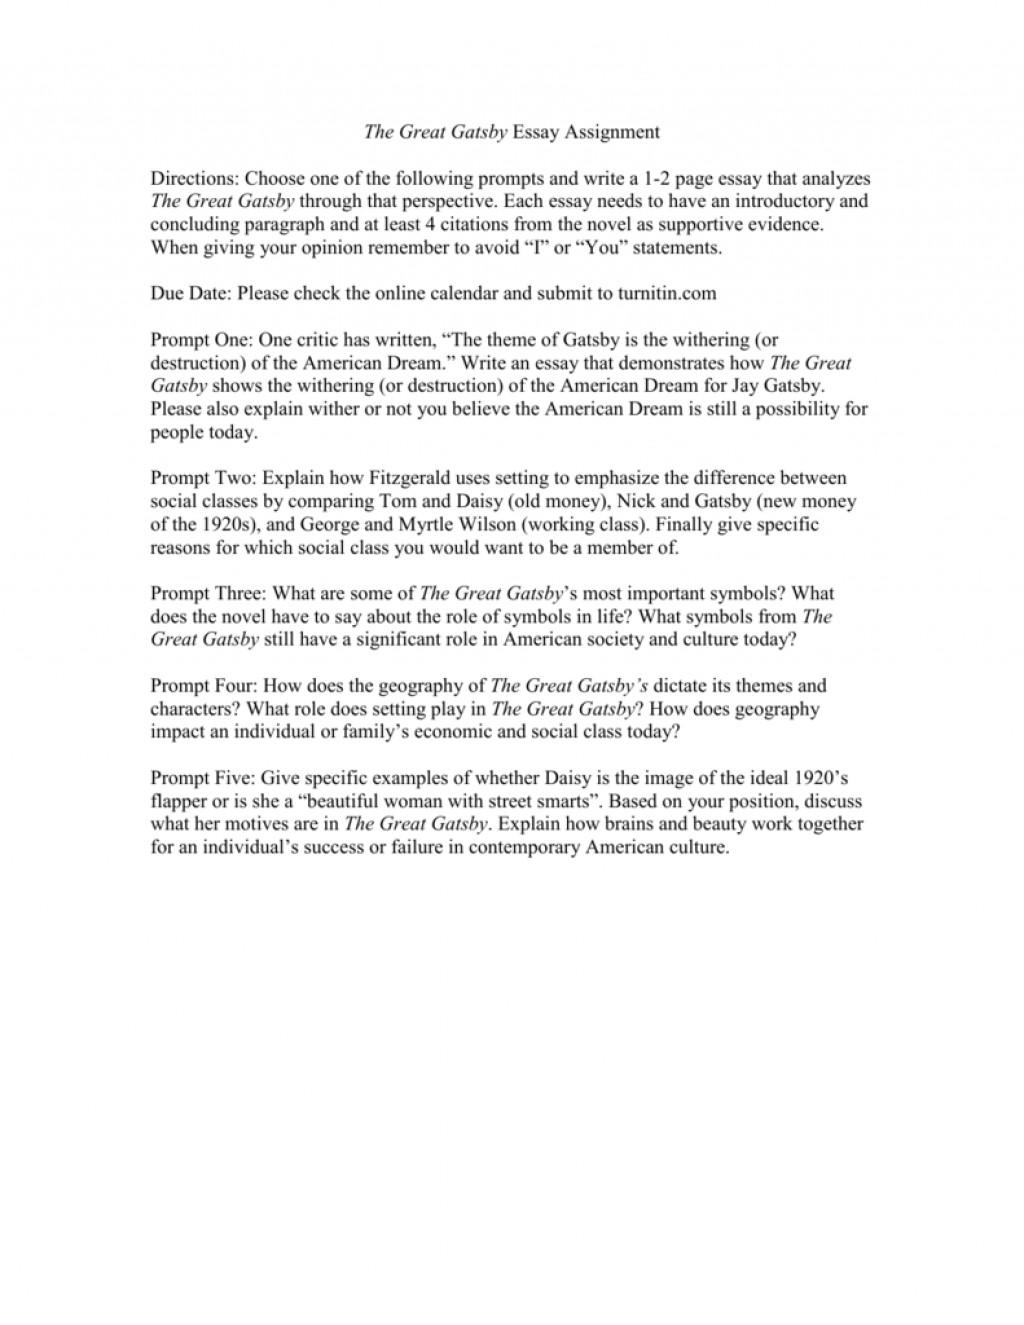 011 American Dream Argumentative Essay Example 008719859 1 Marvelous Examples Topics Argument Prompt Large